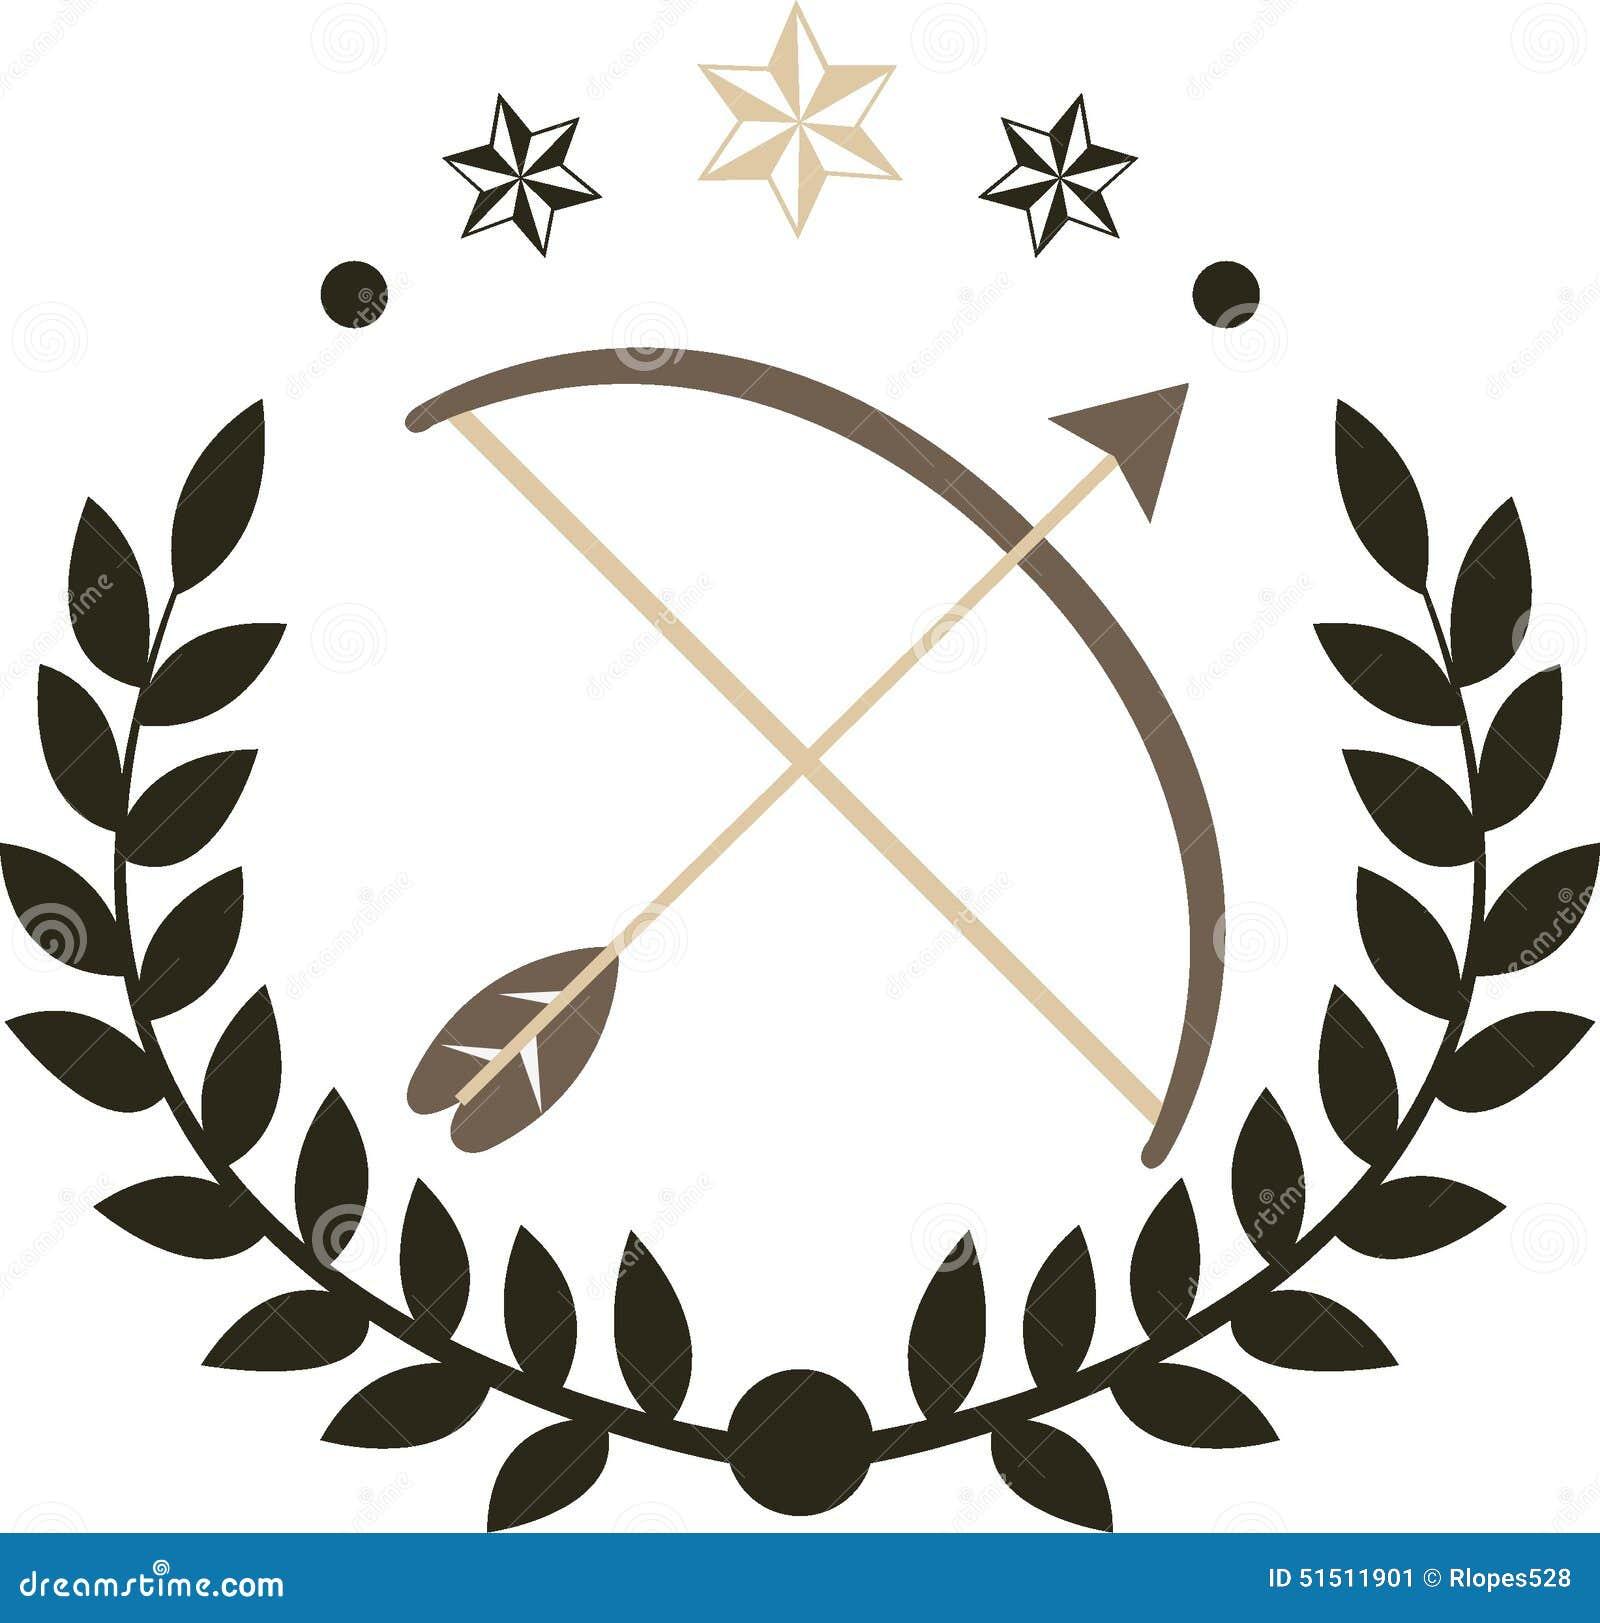 Bow And Arrow Logo Stock Vector Image 51511901